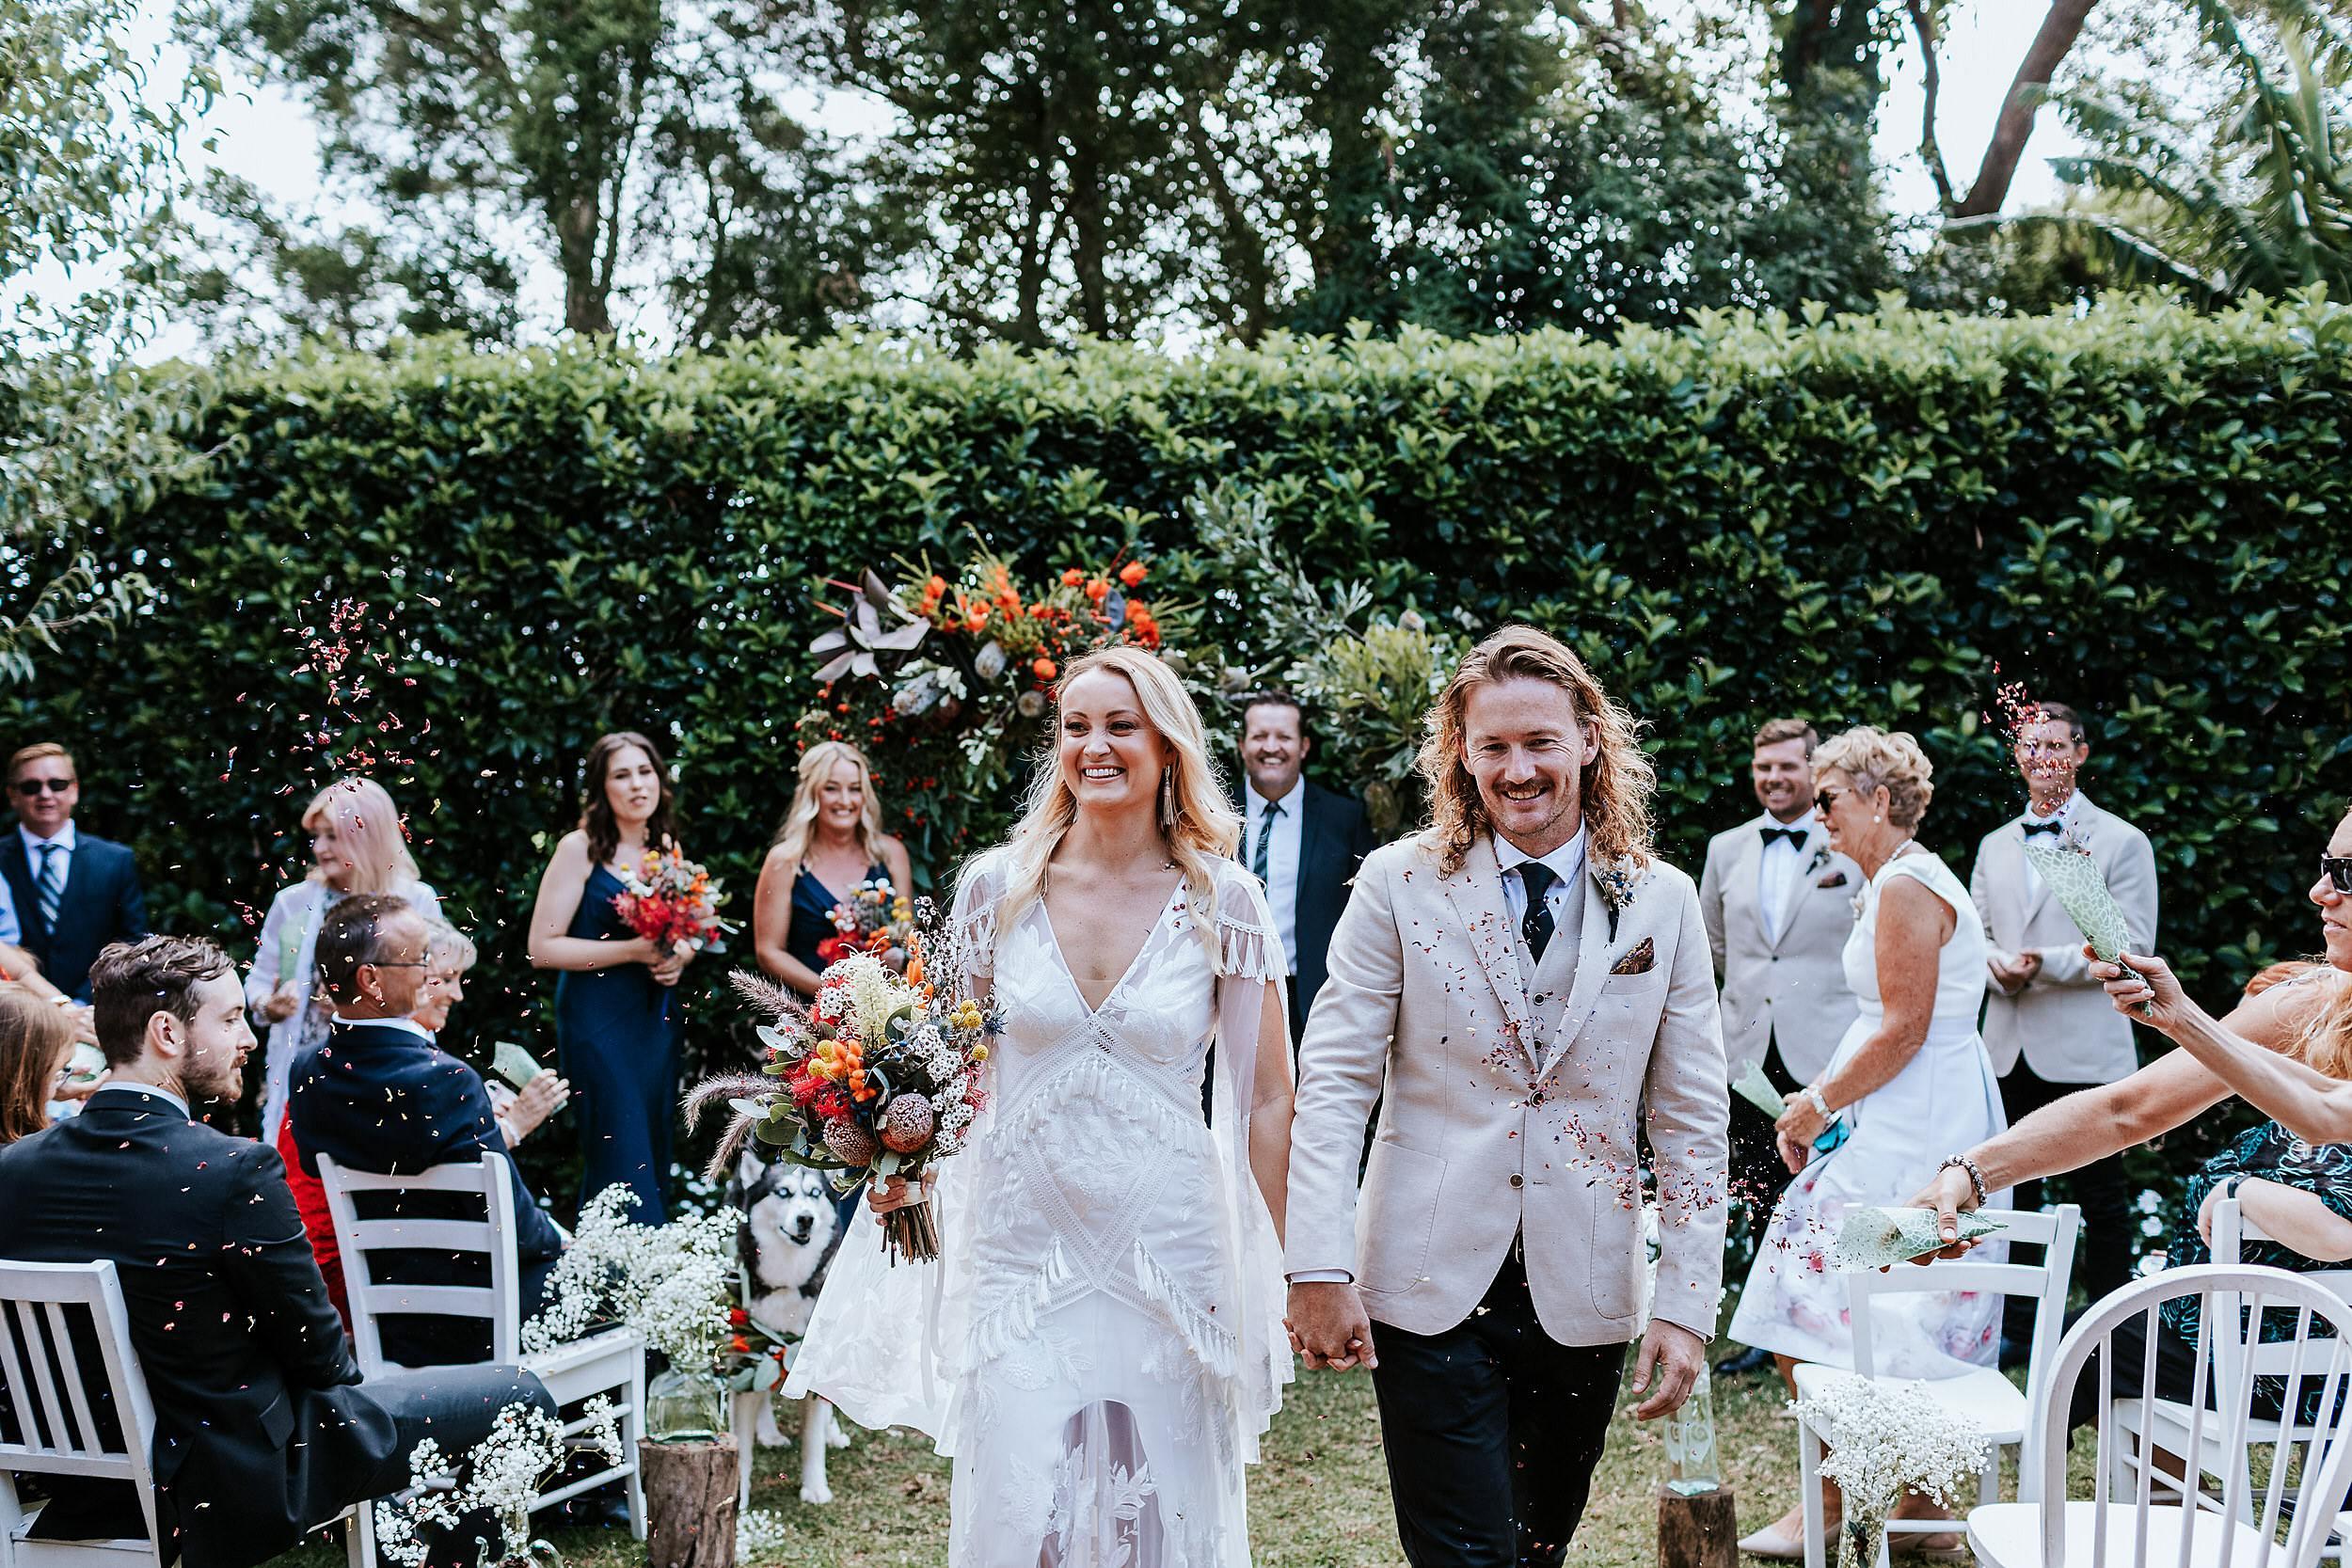 wedding_the_woolshed_steph_zac_0106.jpg